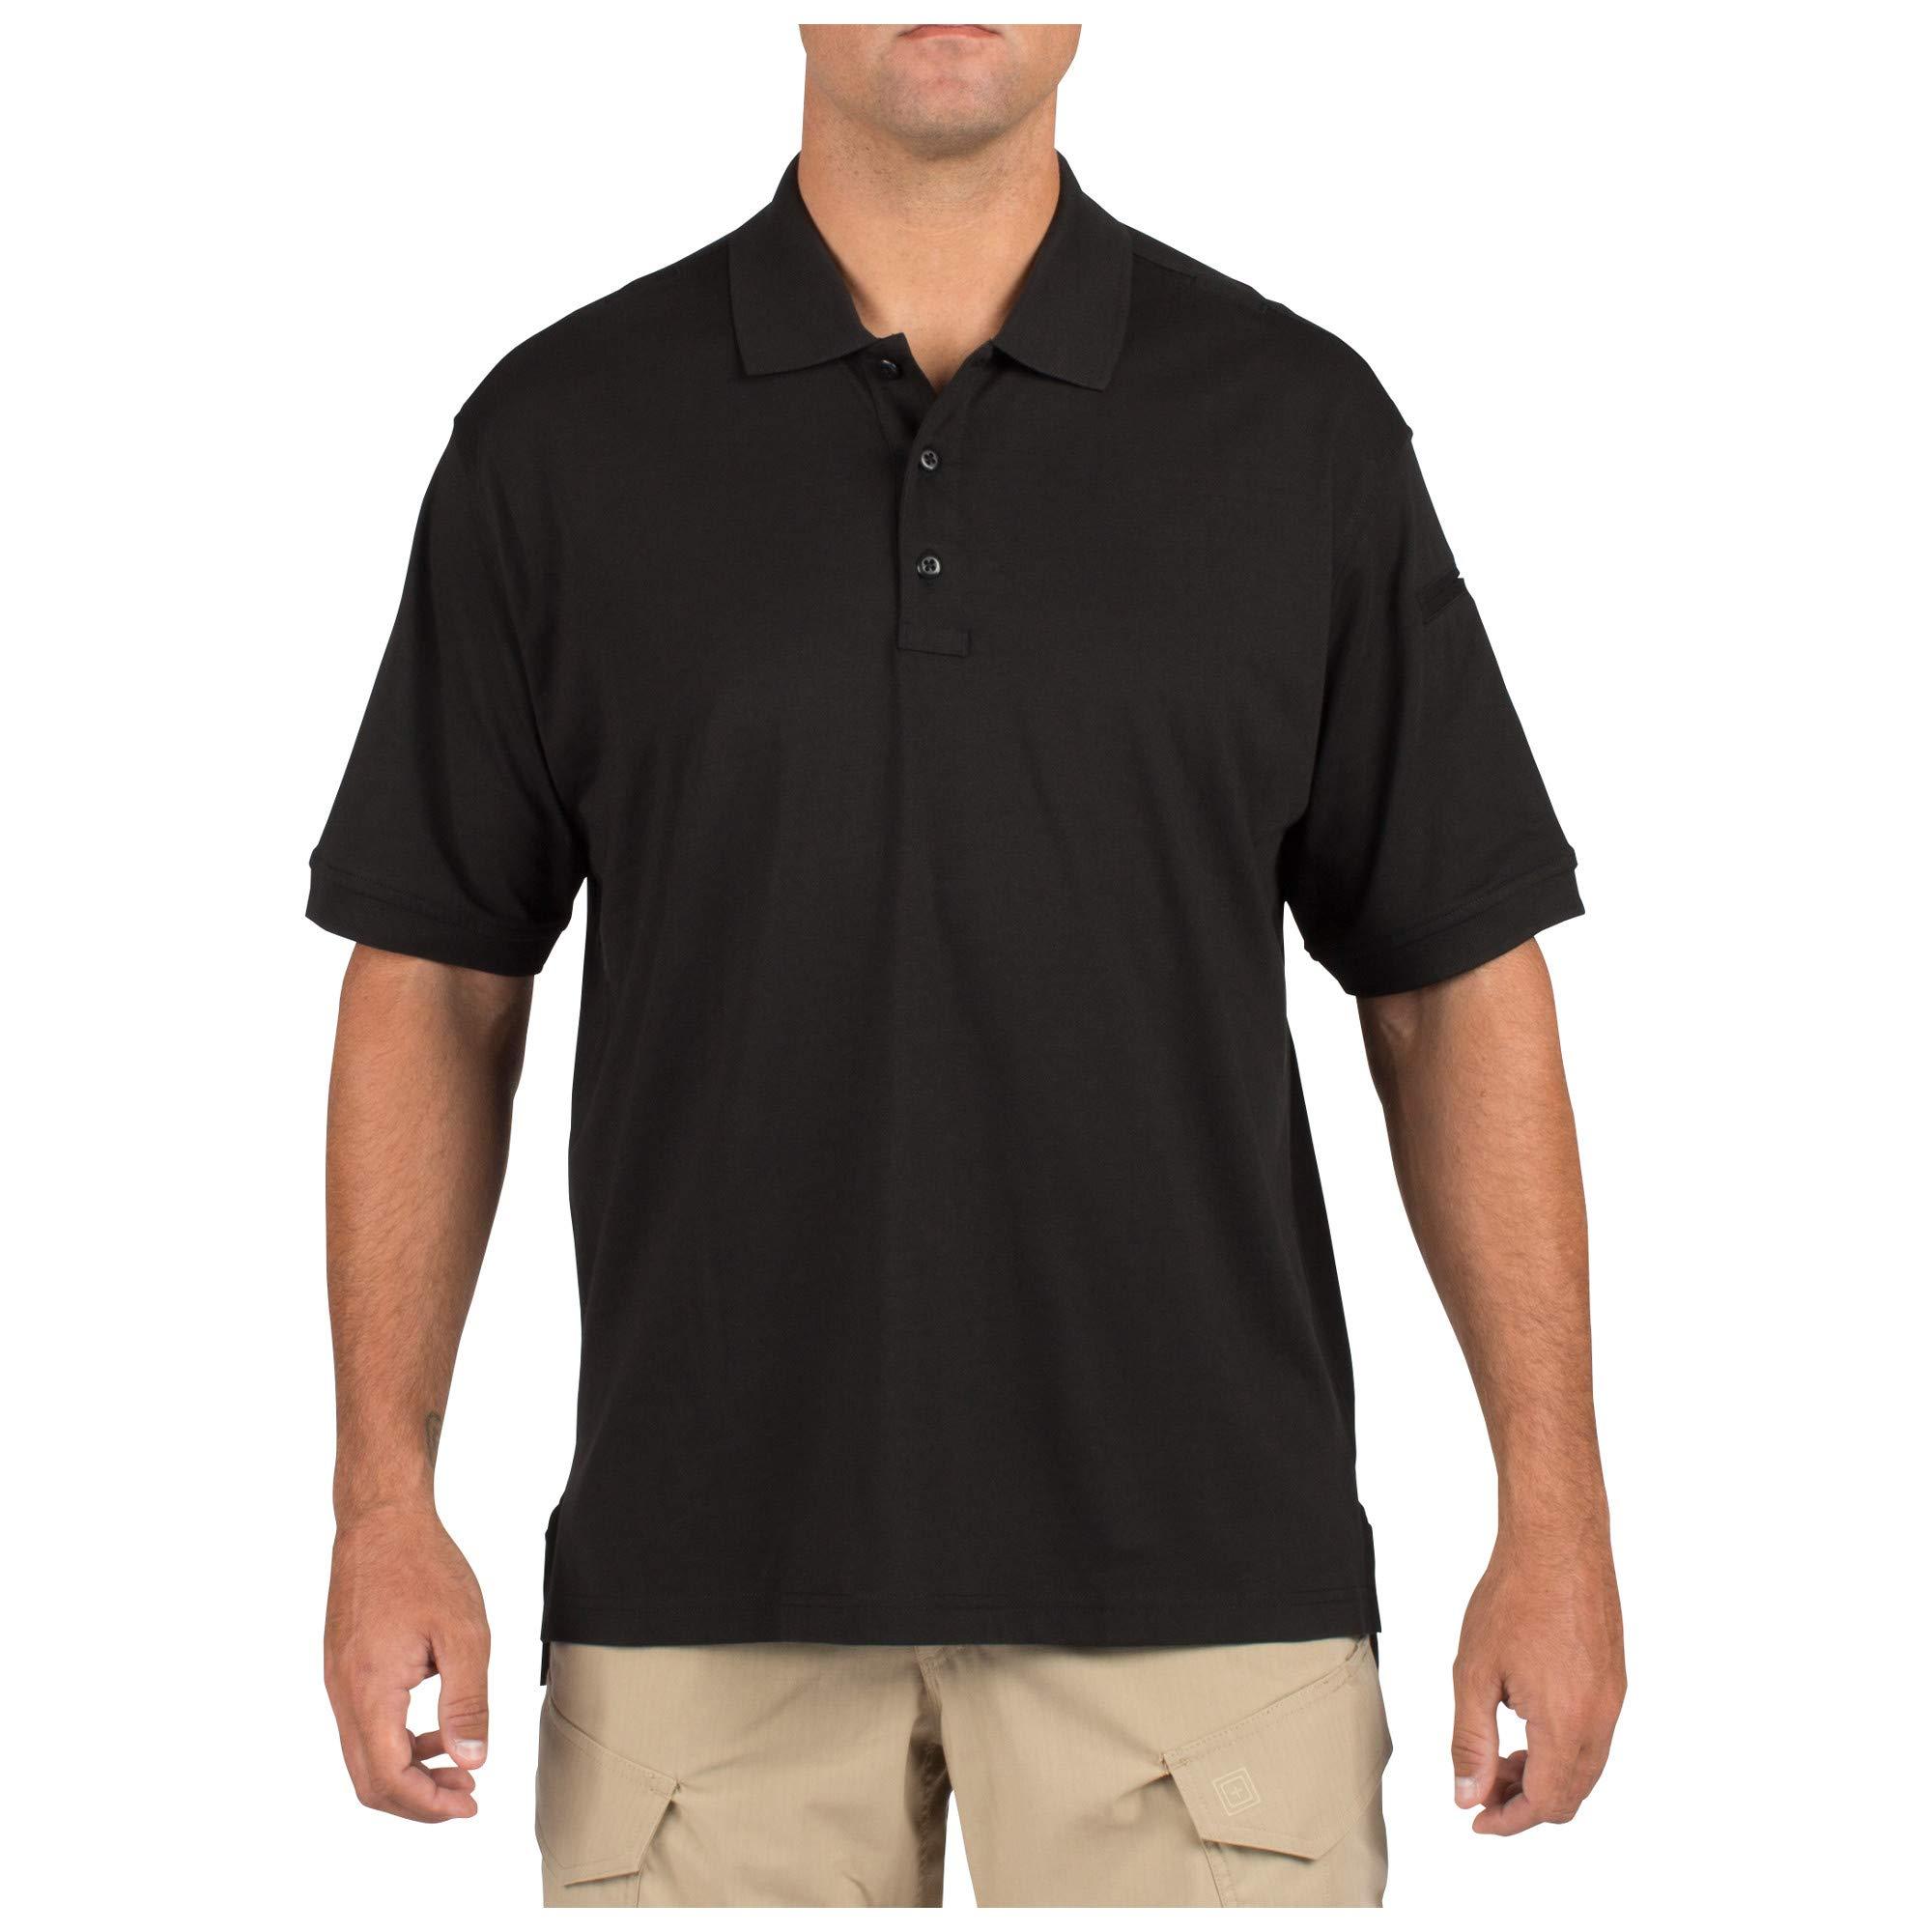 5.11 Tactical Tactical Short-Sleeve Polo, Black, Small